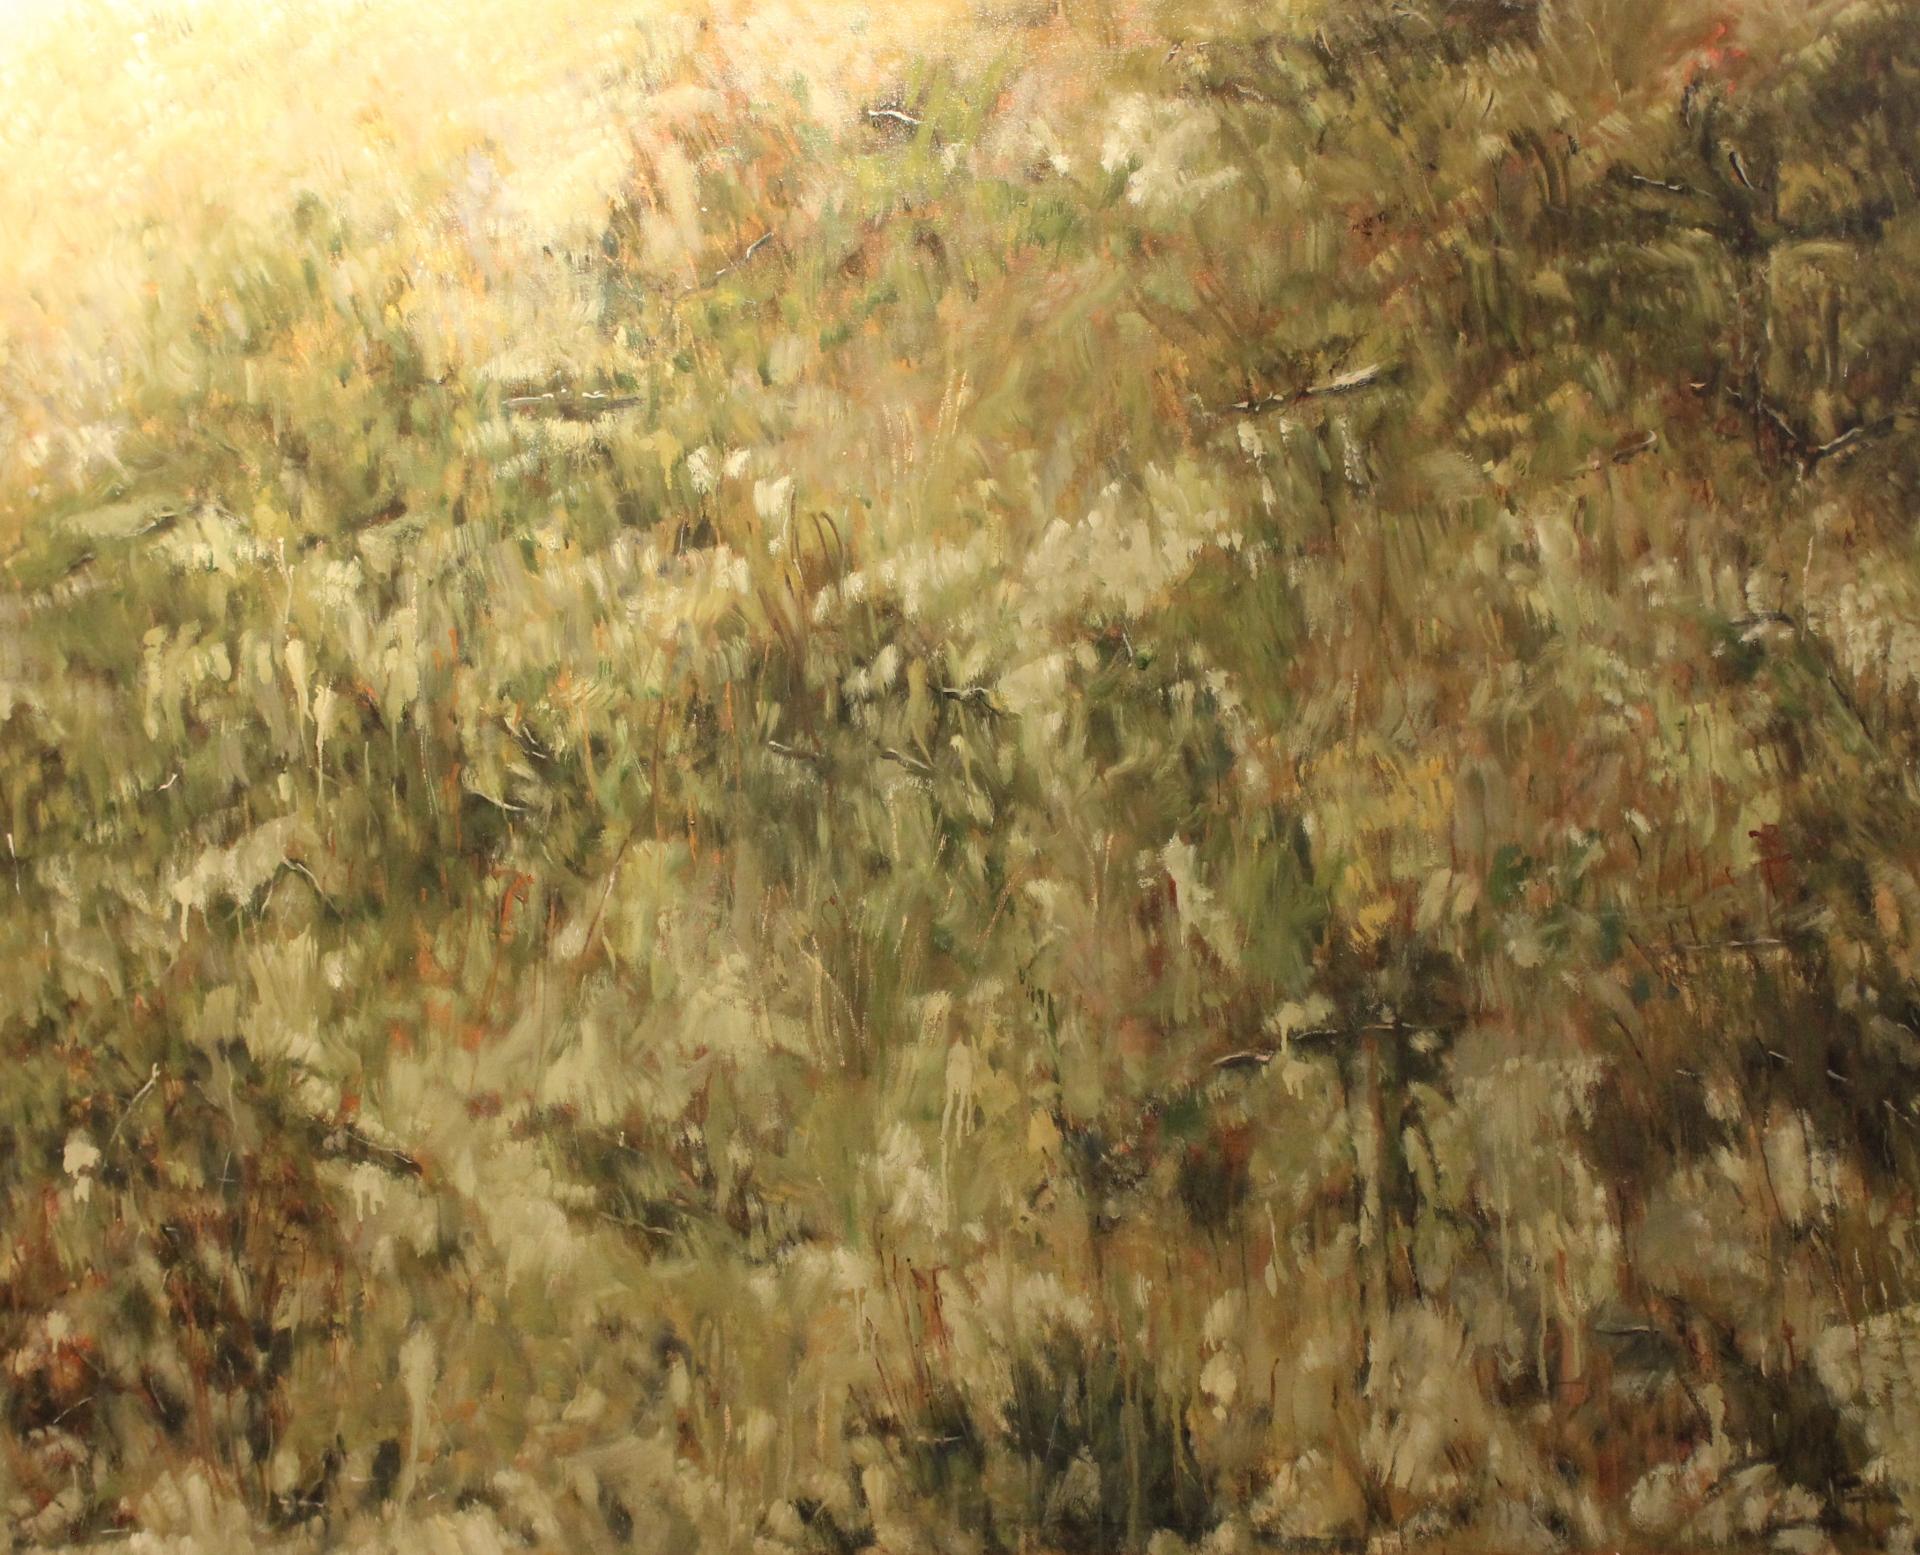 HILLSIDE GRASSES/PRAIRIE I - 48X60 - OIL ON CANVAS - 2010